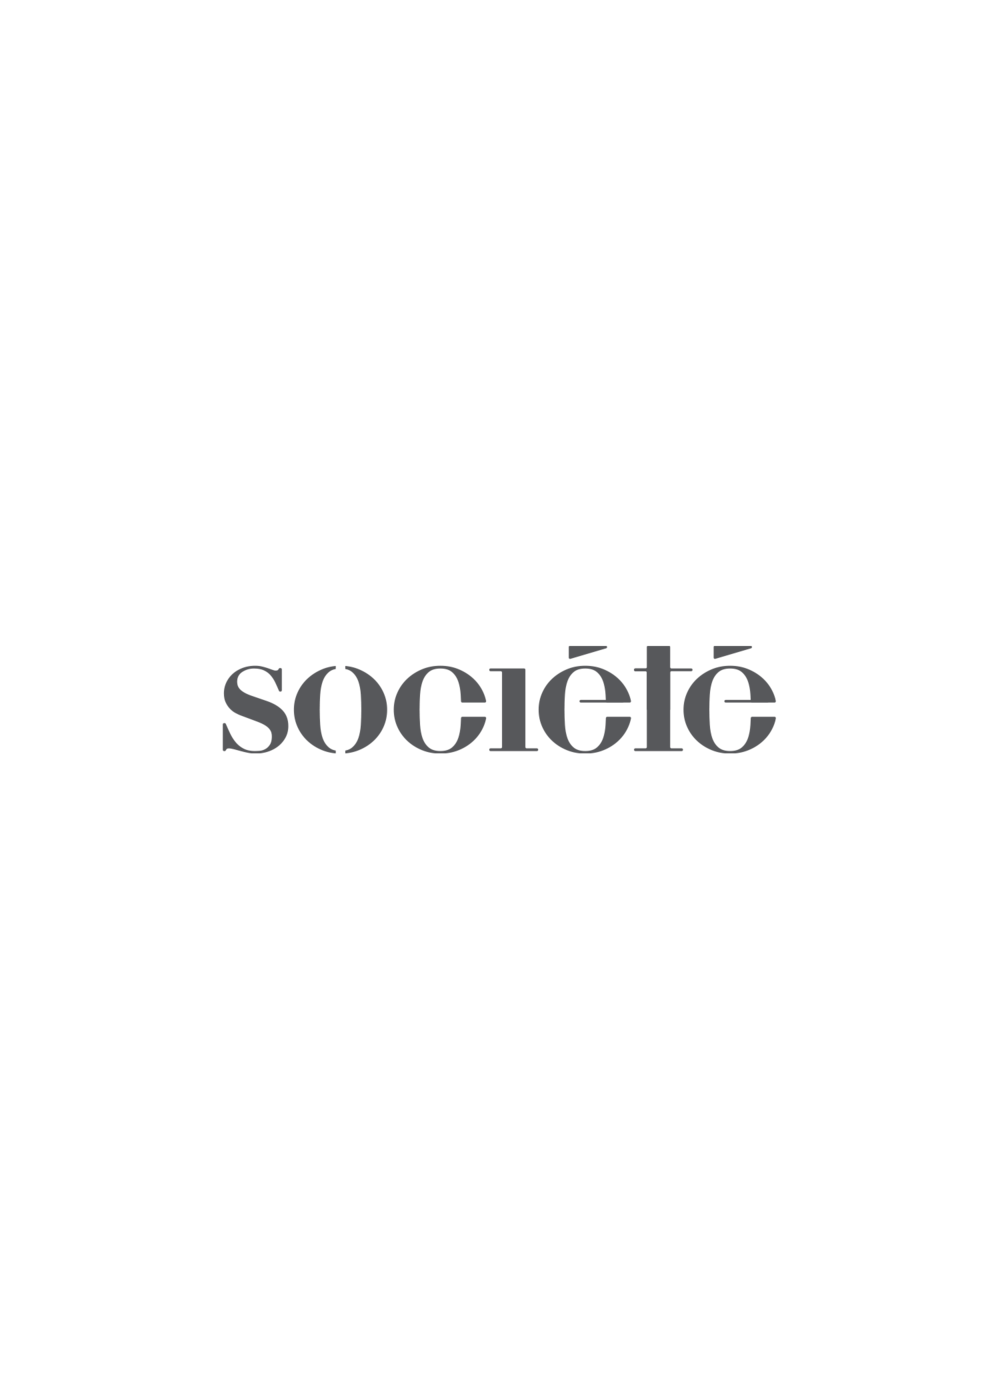 logo_societe.png